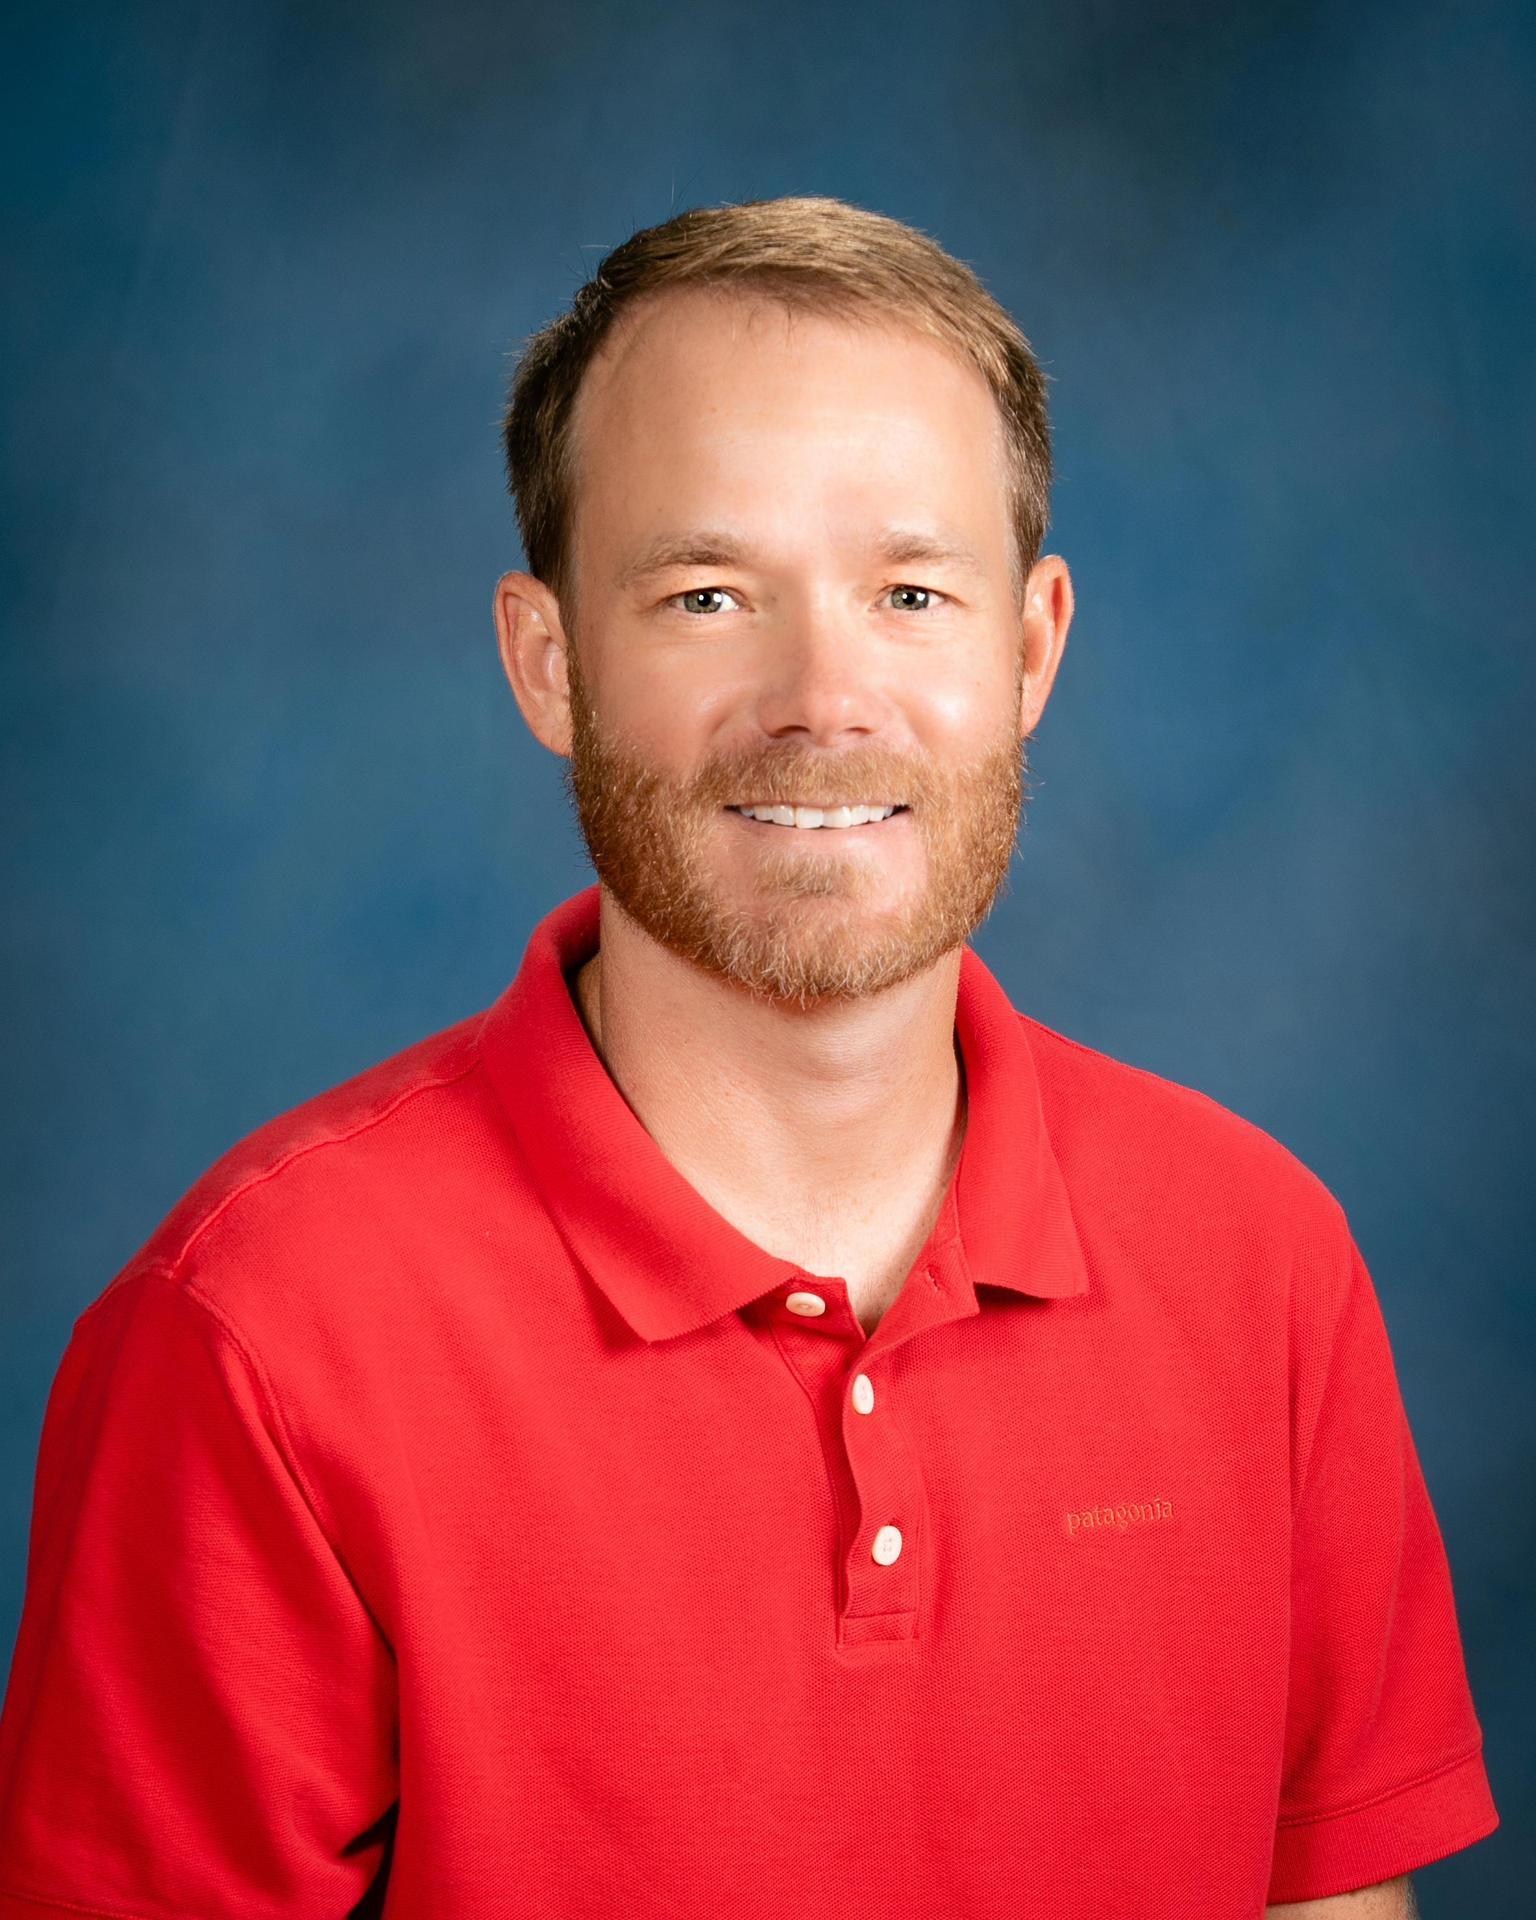 Picture of Assistant Principal Josh Snider